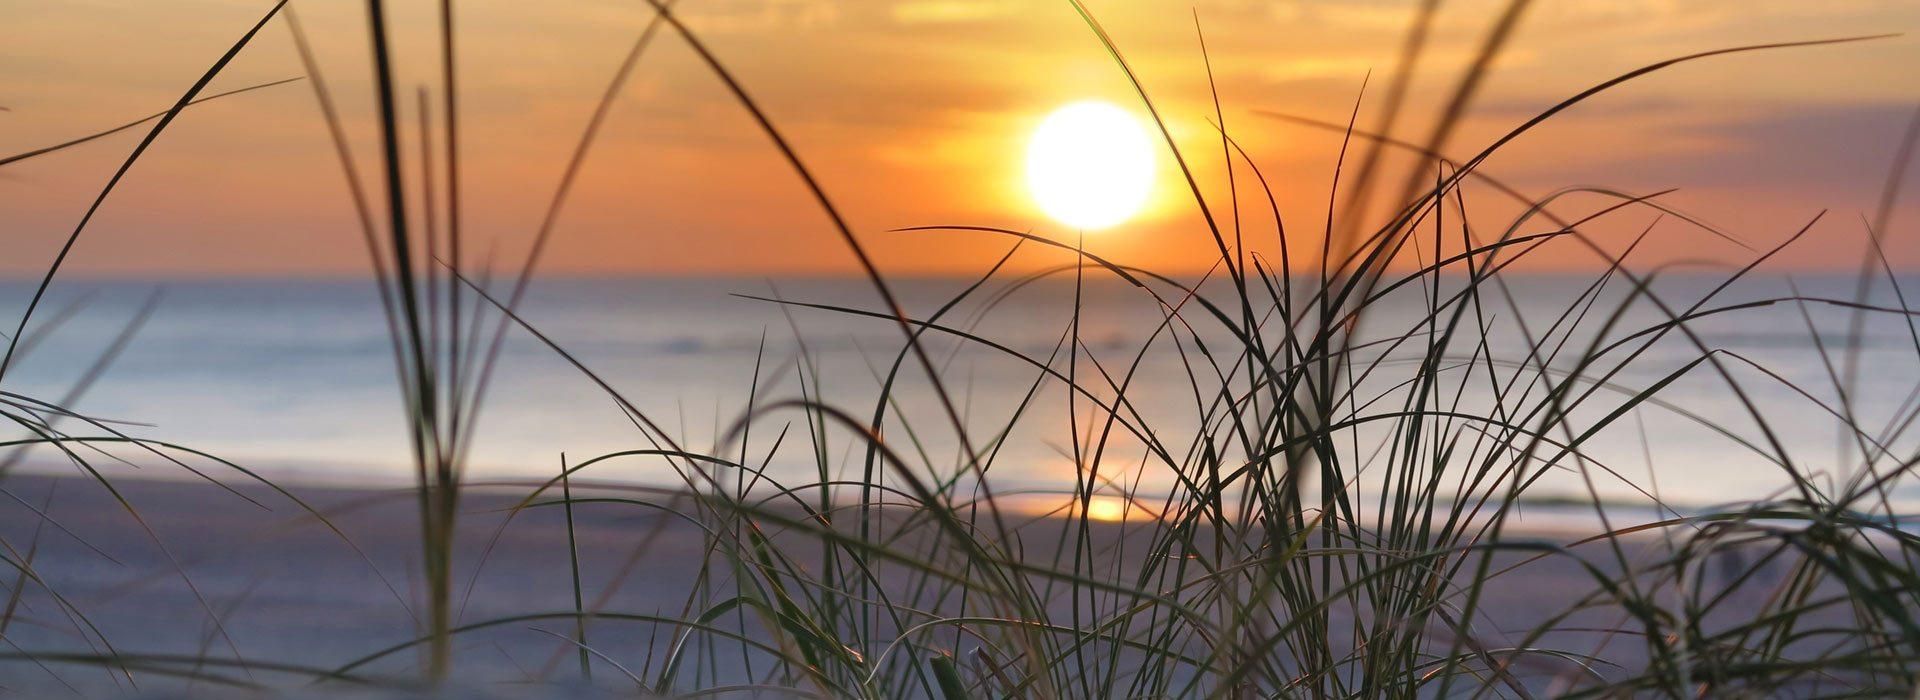 Nordsee - Sonnenuntergang am Strand